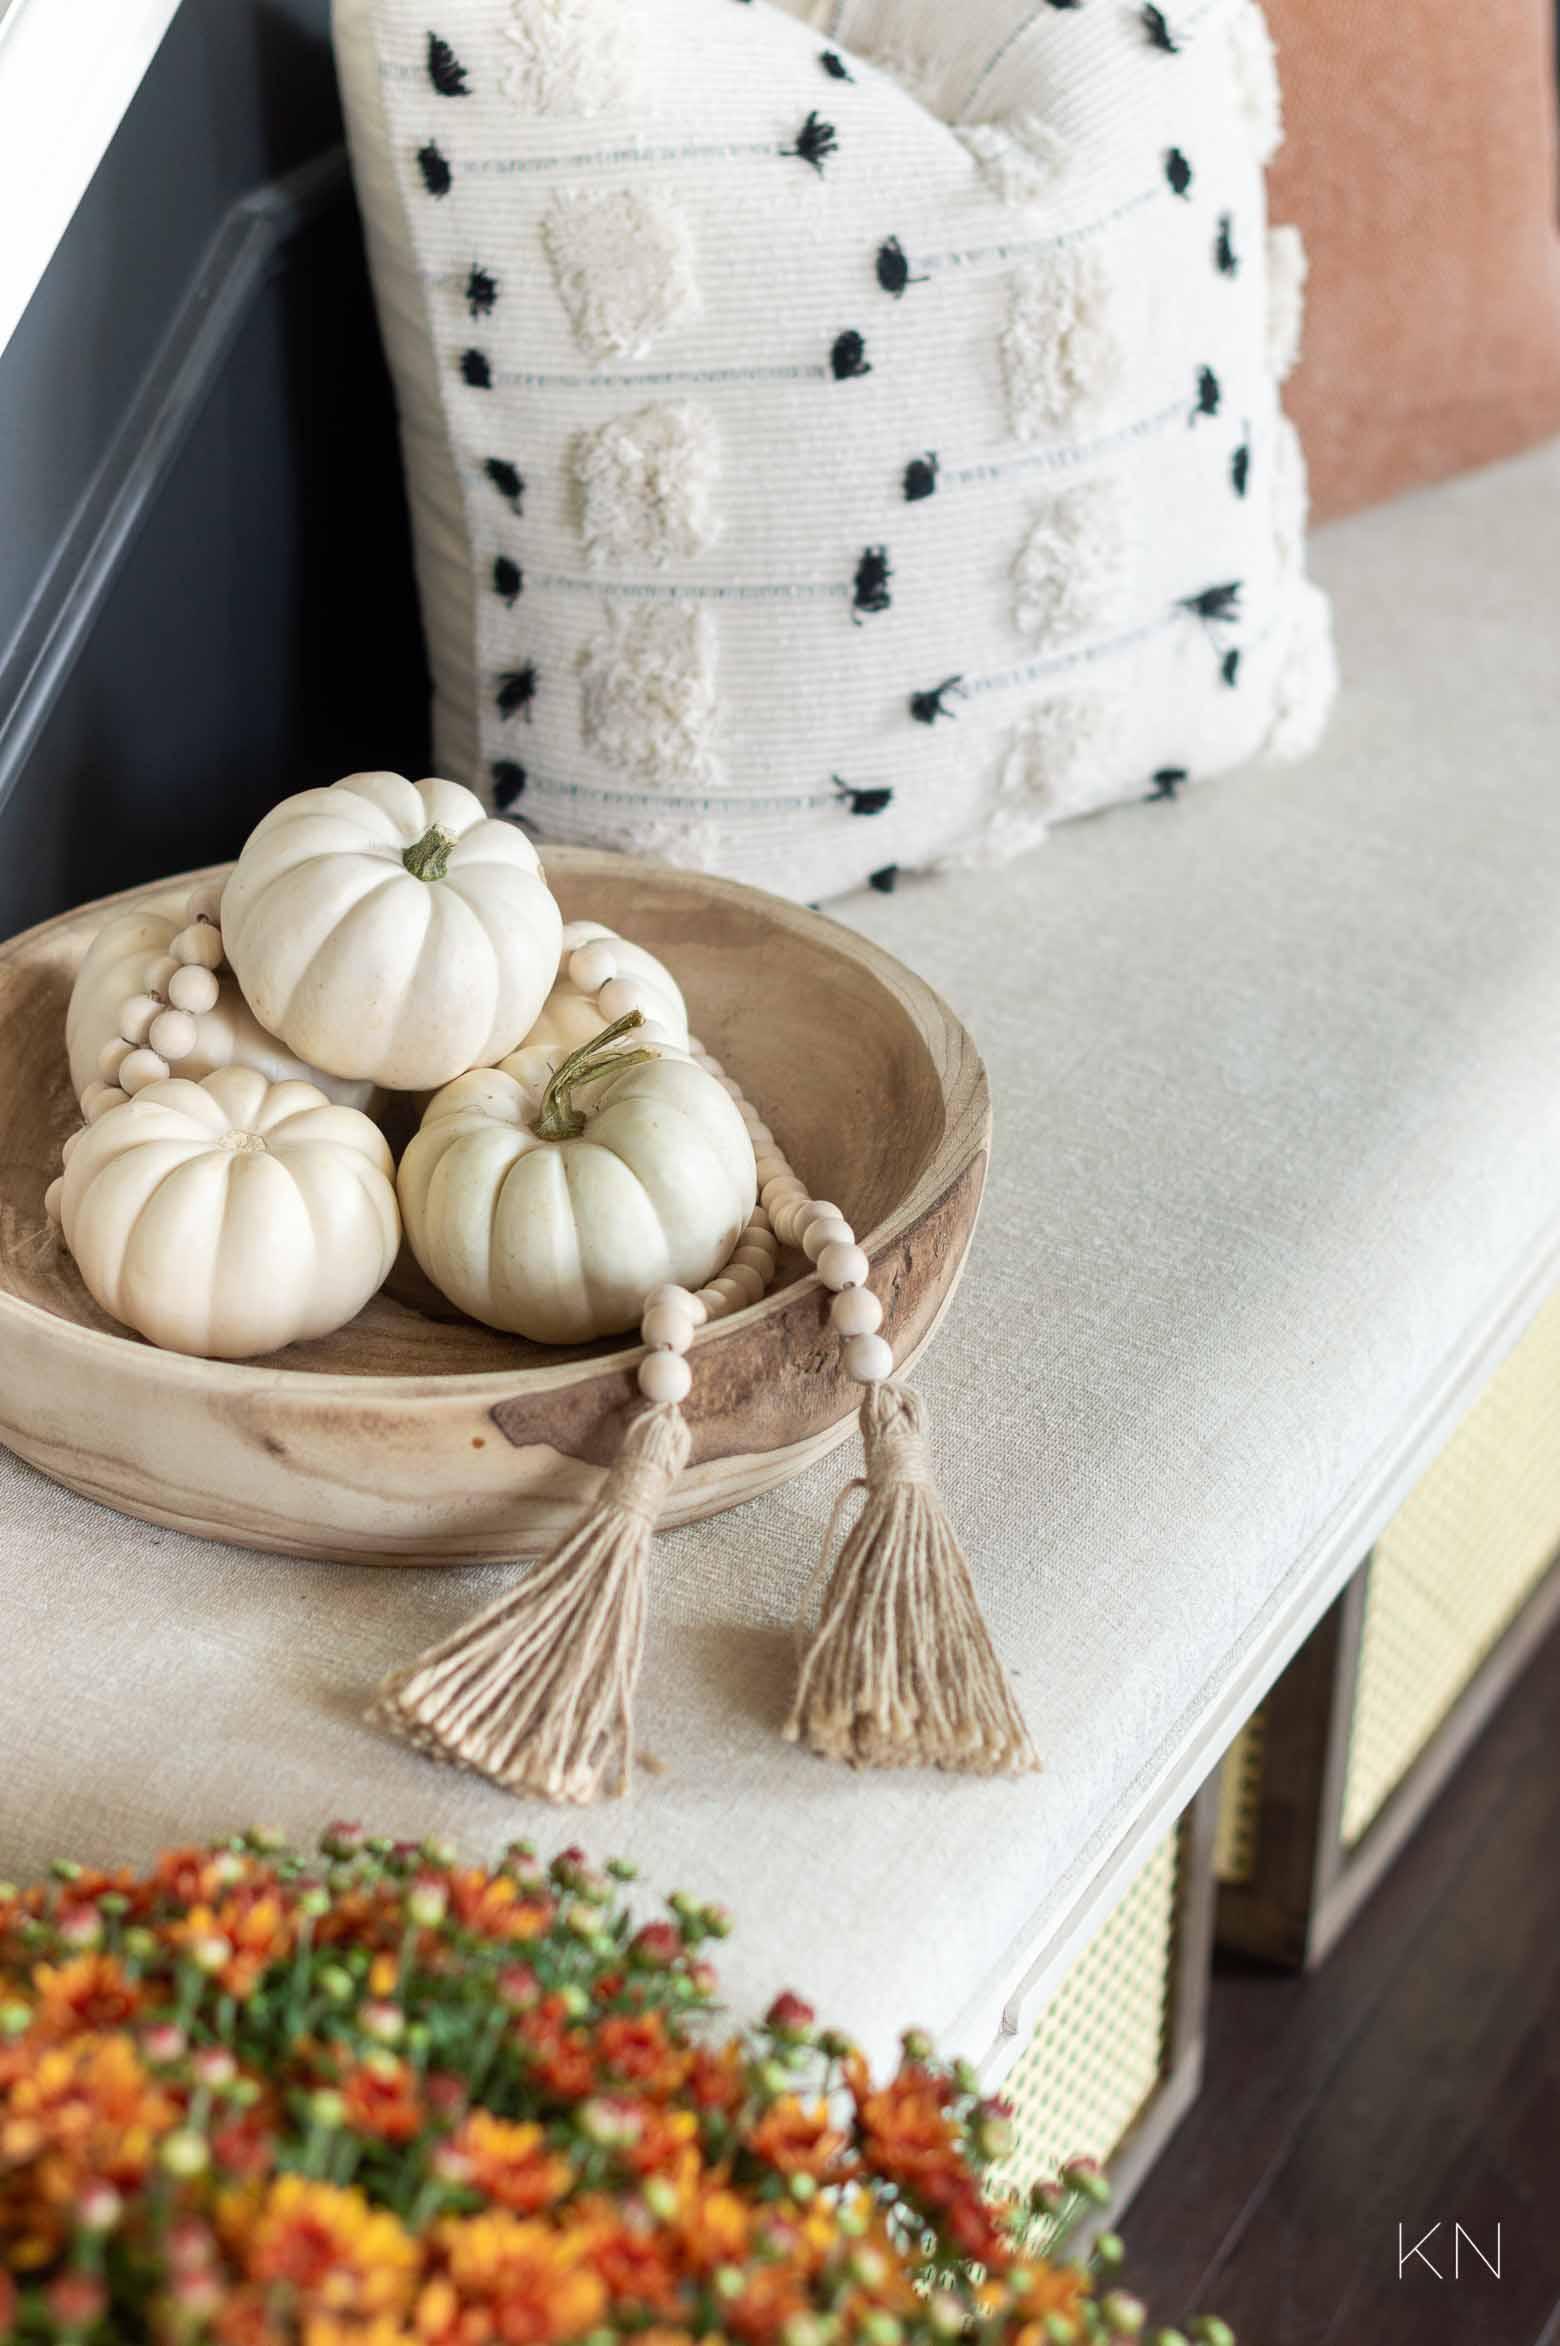 Simple Home Decor Ideas for Fall